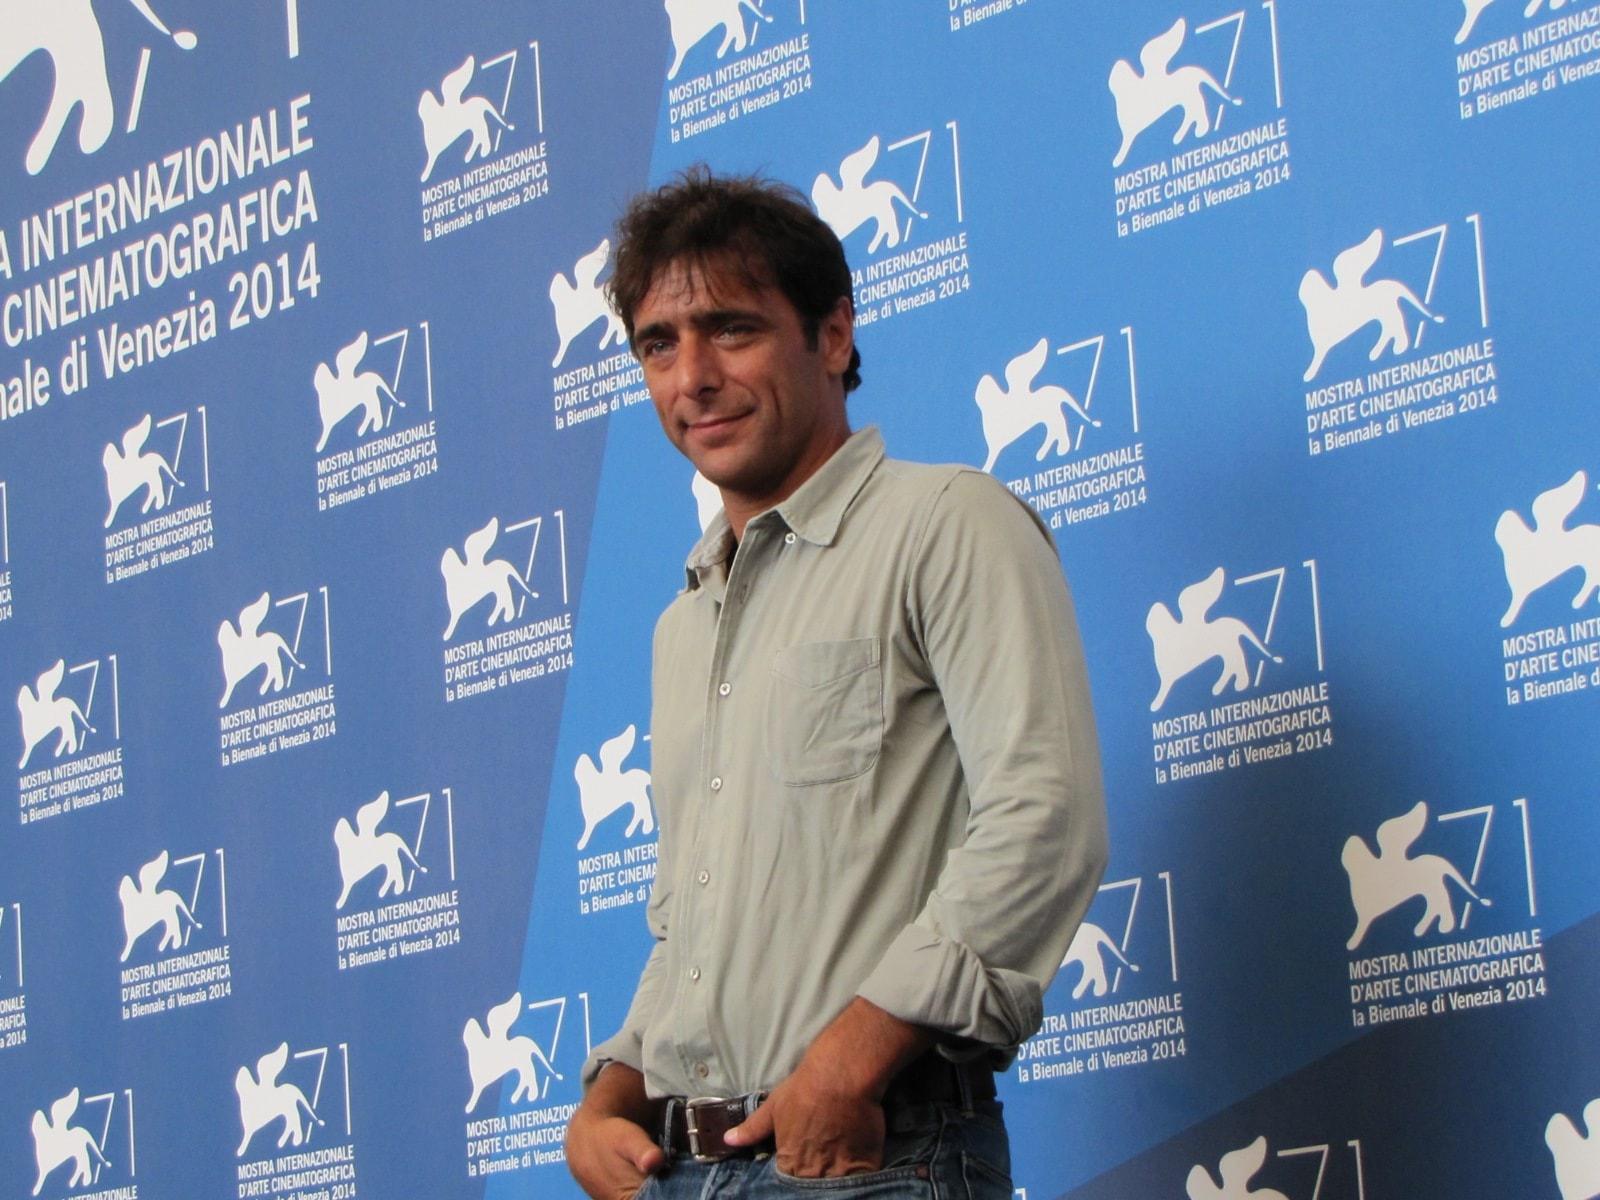 Adriano Giannini Wallpapers hd